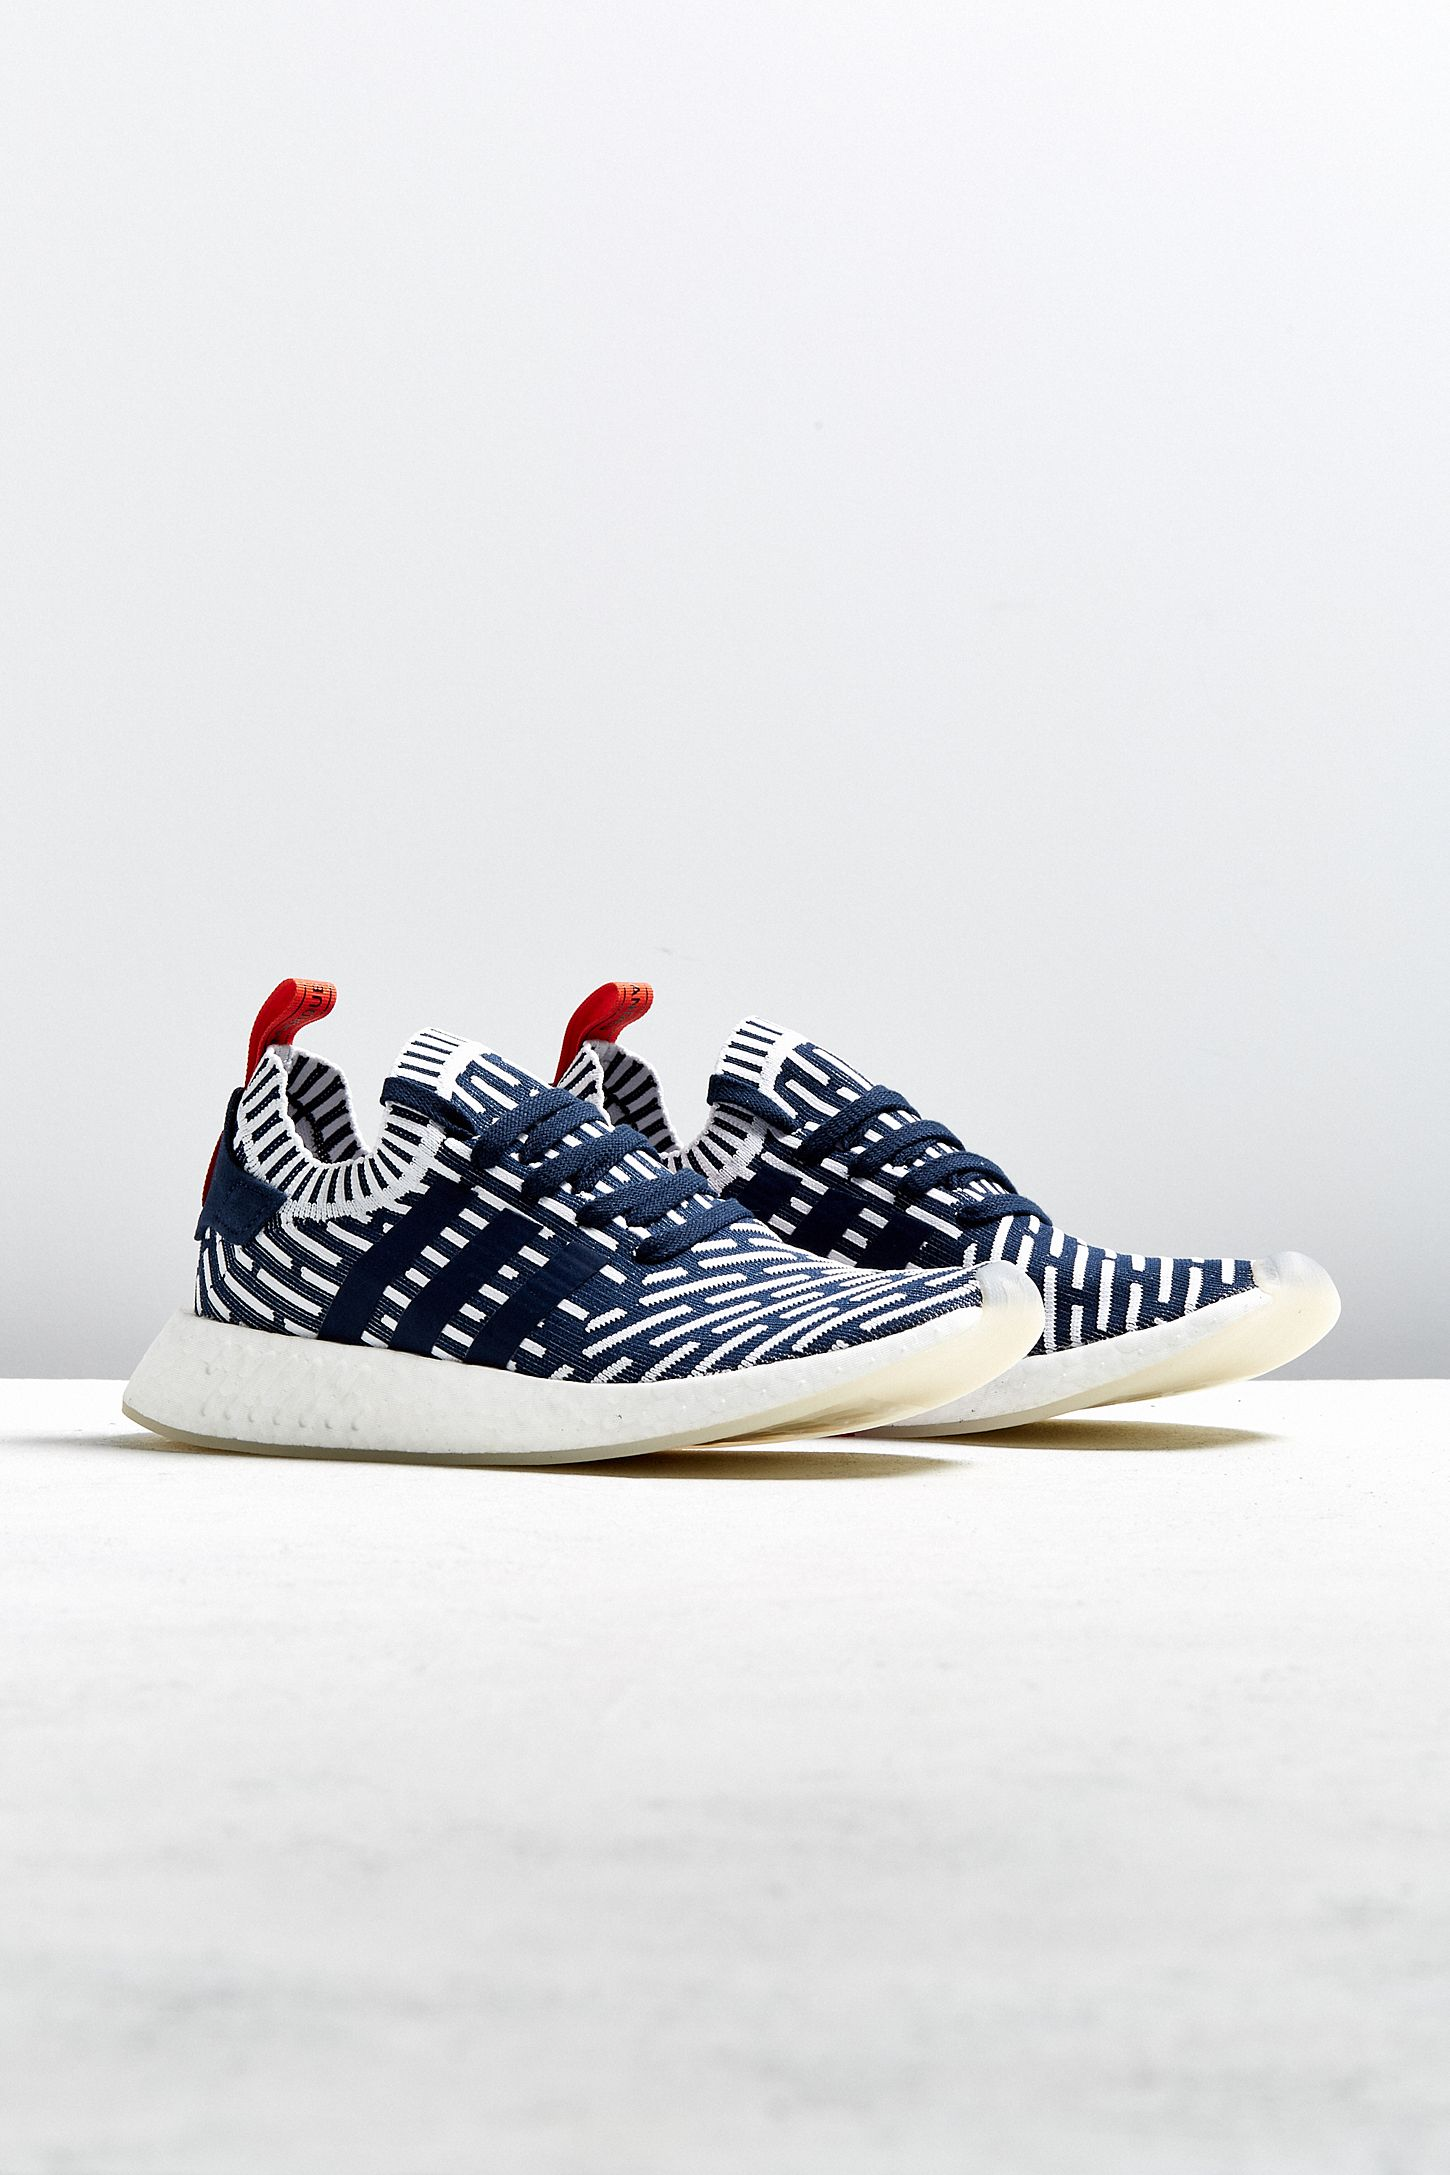 51c008c03 adidas NMD R2 Primeknit Sneaker